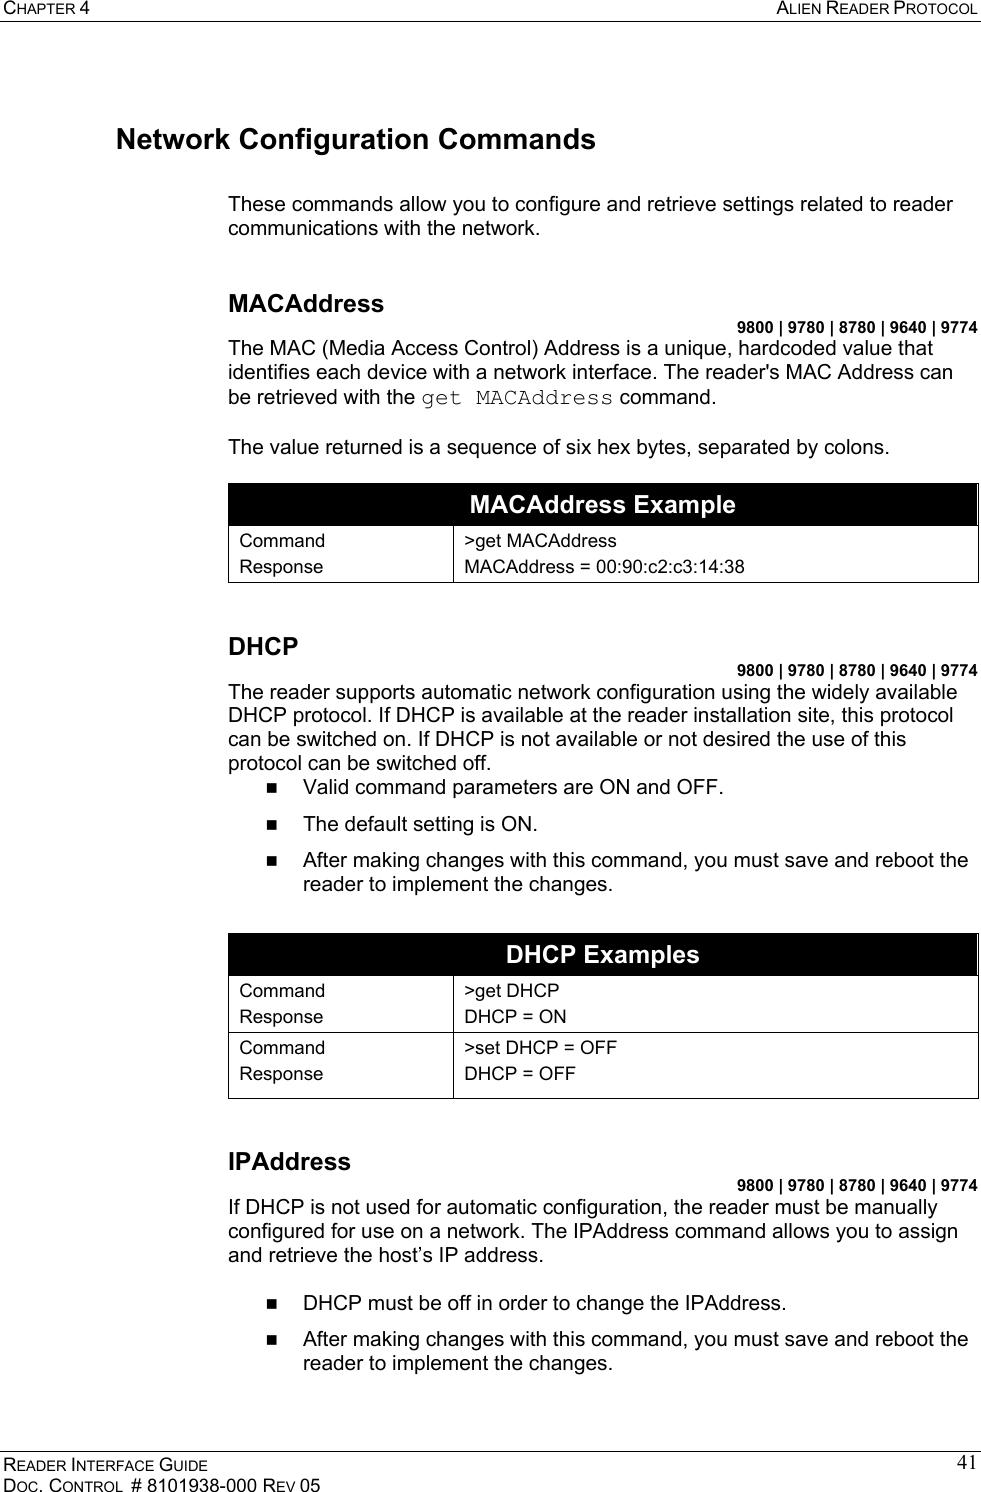 Alien Technology ALR9800 RFID Reader User Manual Guide Reader Interface